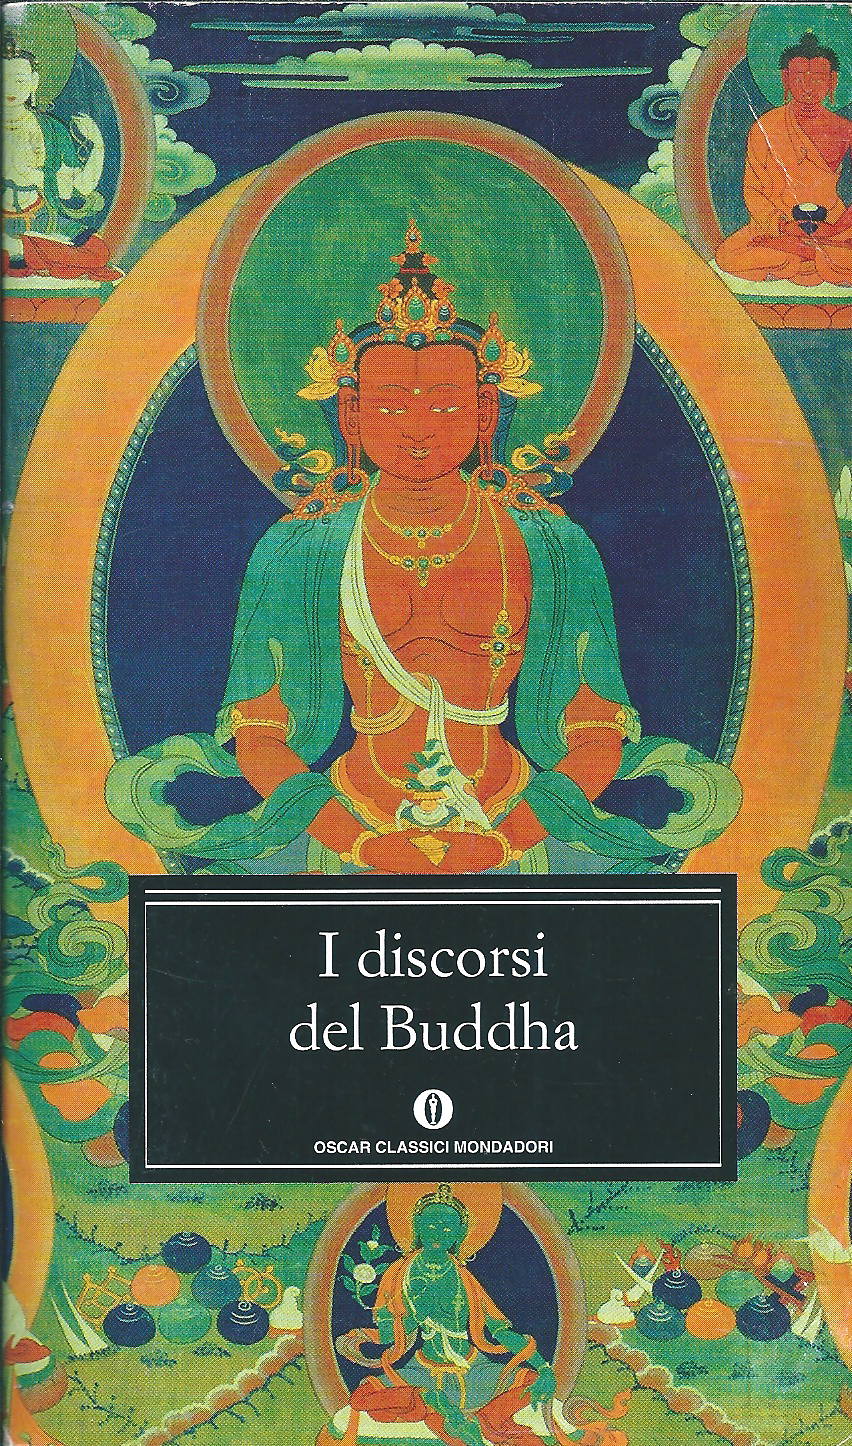 I discorsi del Buddha